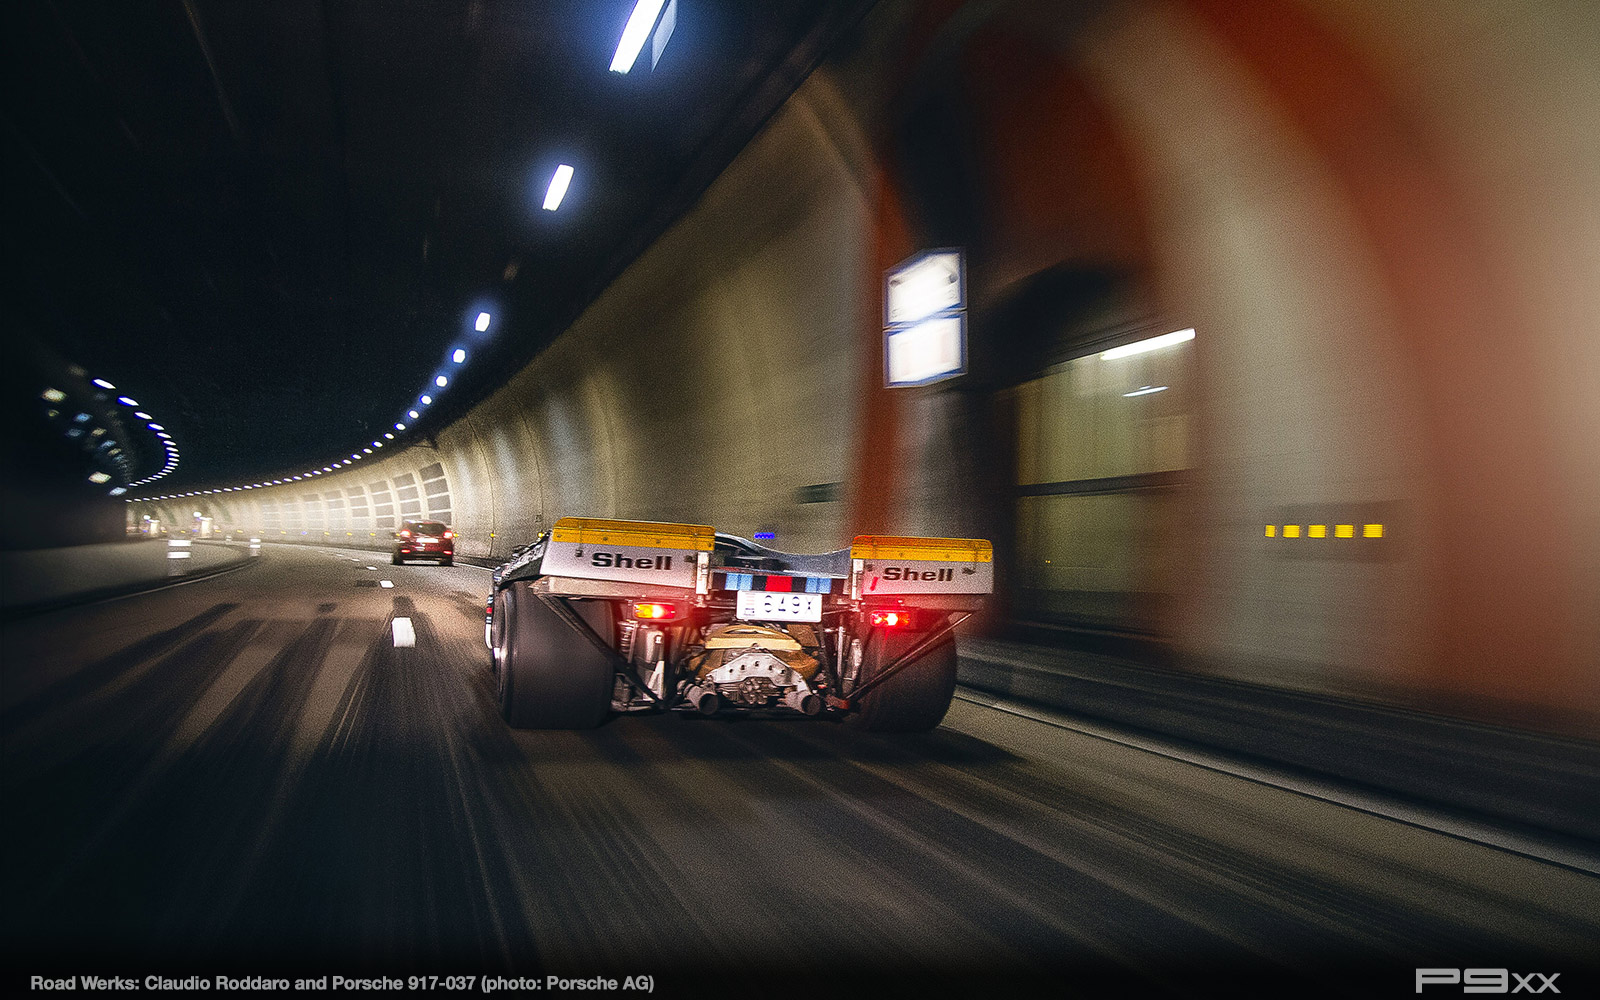 Porsche-917-037-Martini-Racing-Monaco-2018-303